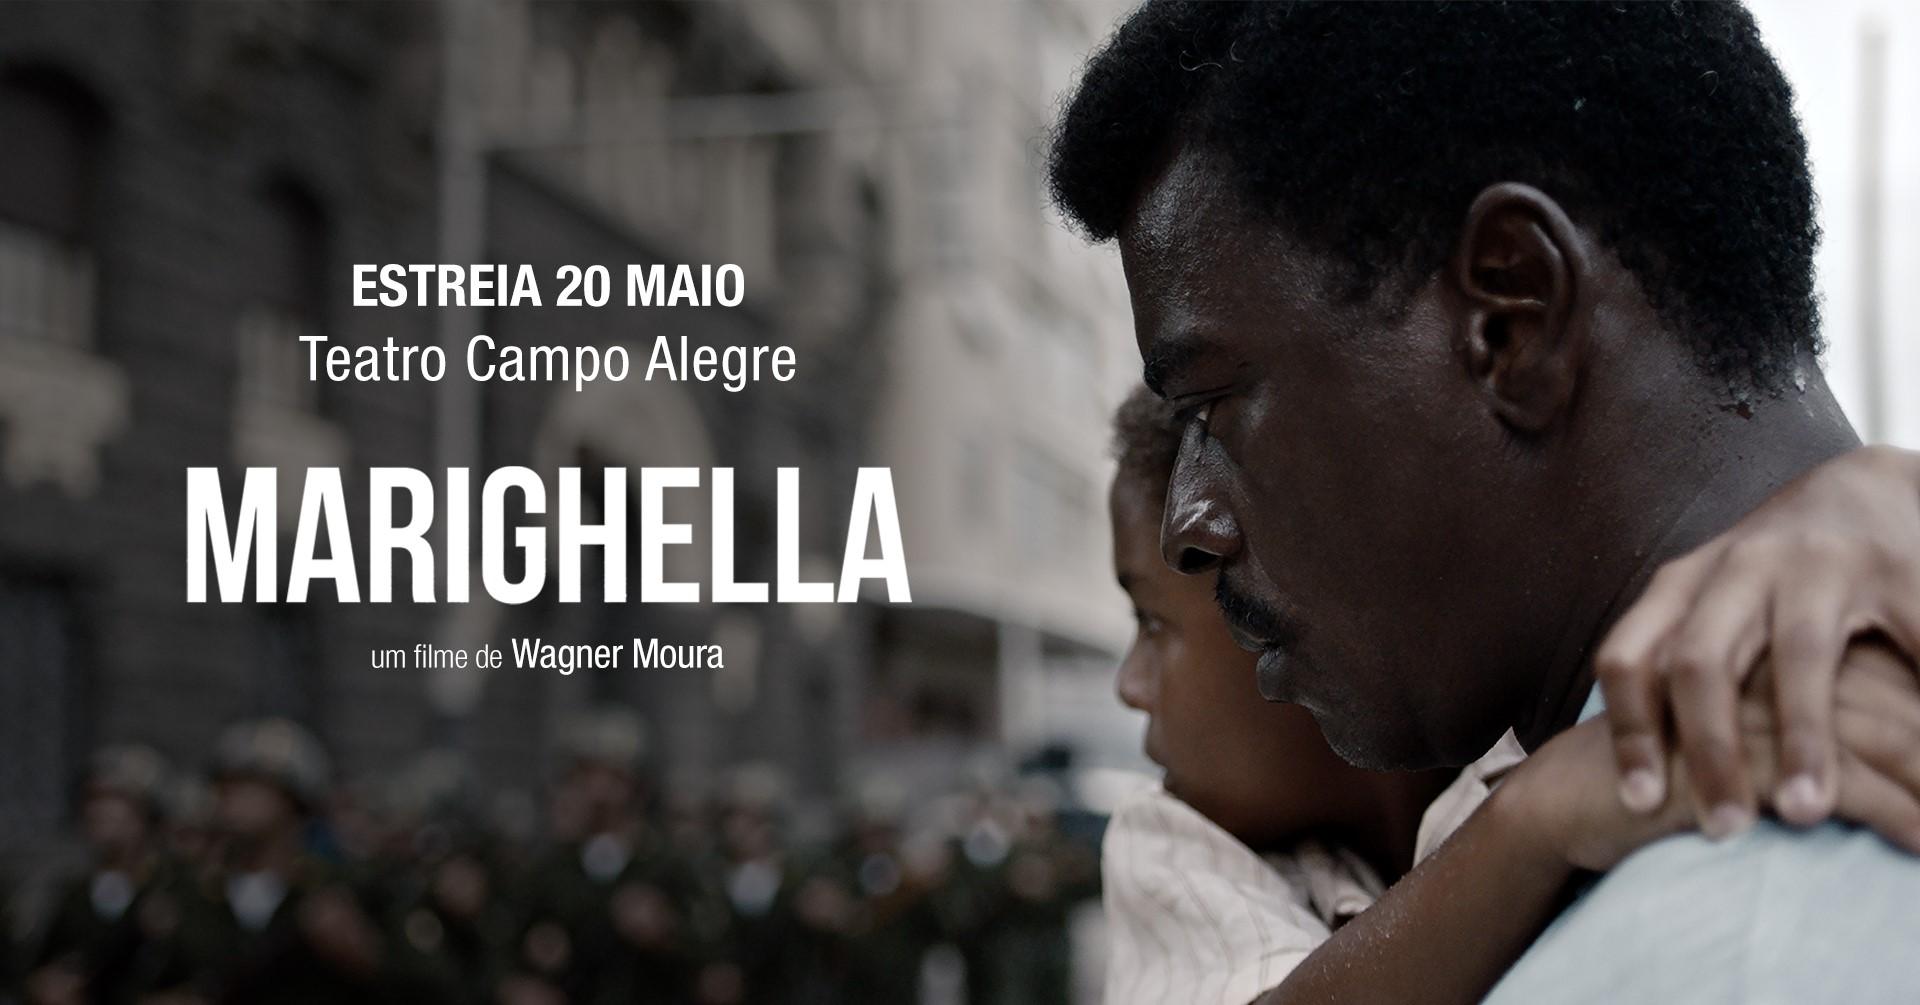 MARIGHELLA (2019), de Wagner Moura - ESTREIA no Campo Alegre